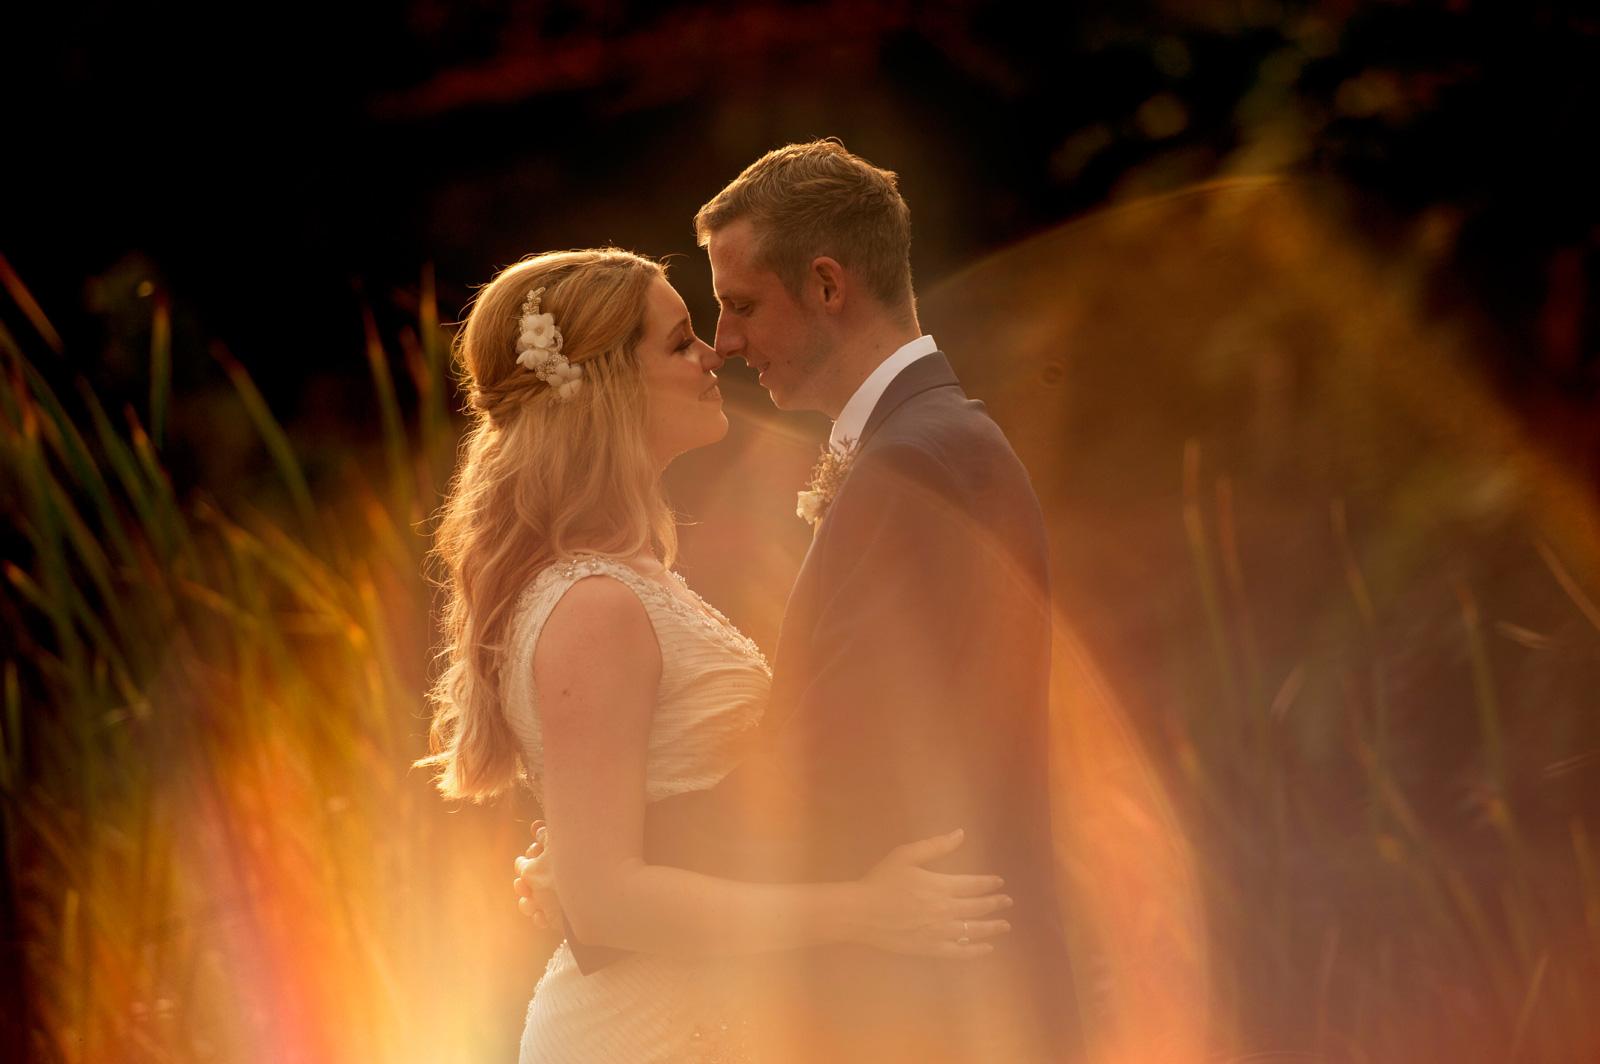 Sun flare and couple Zimbali